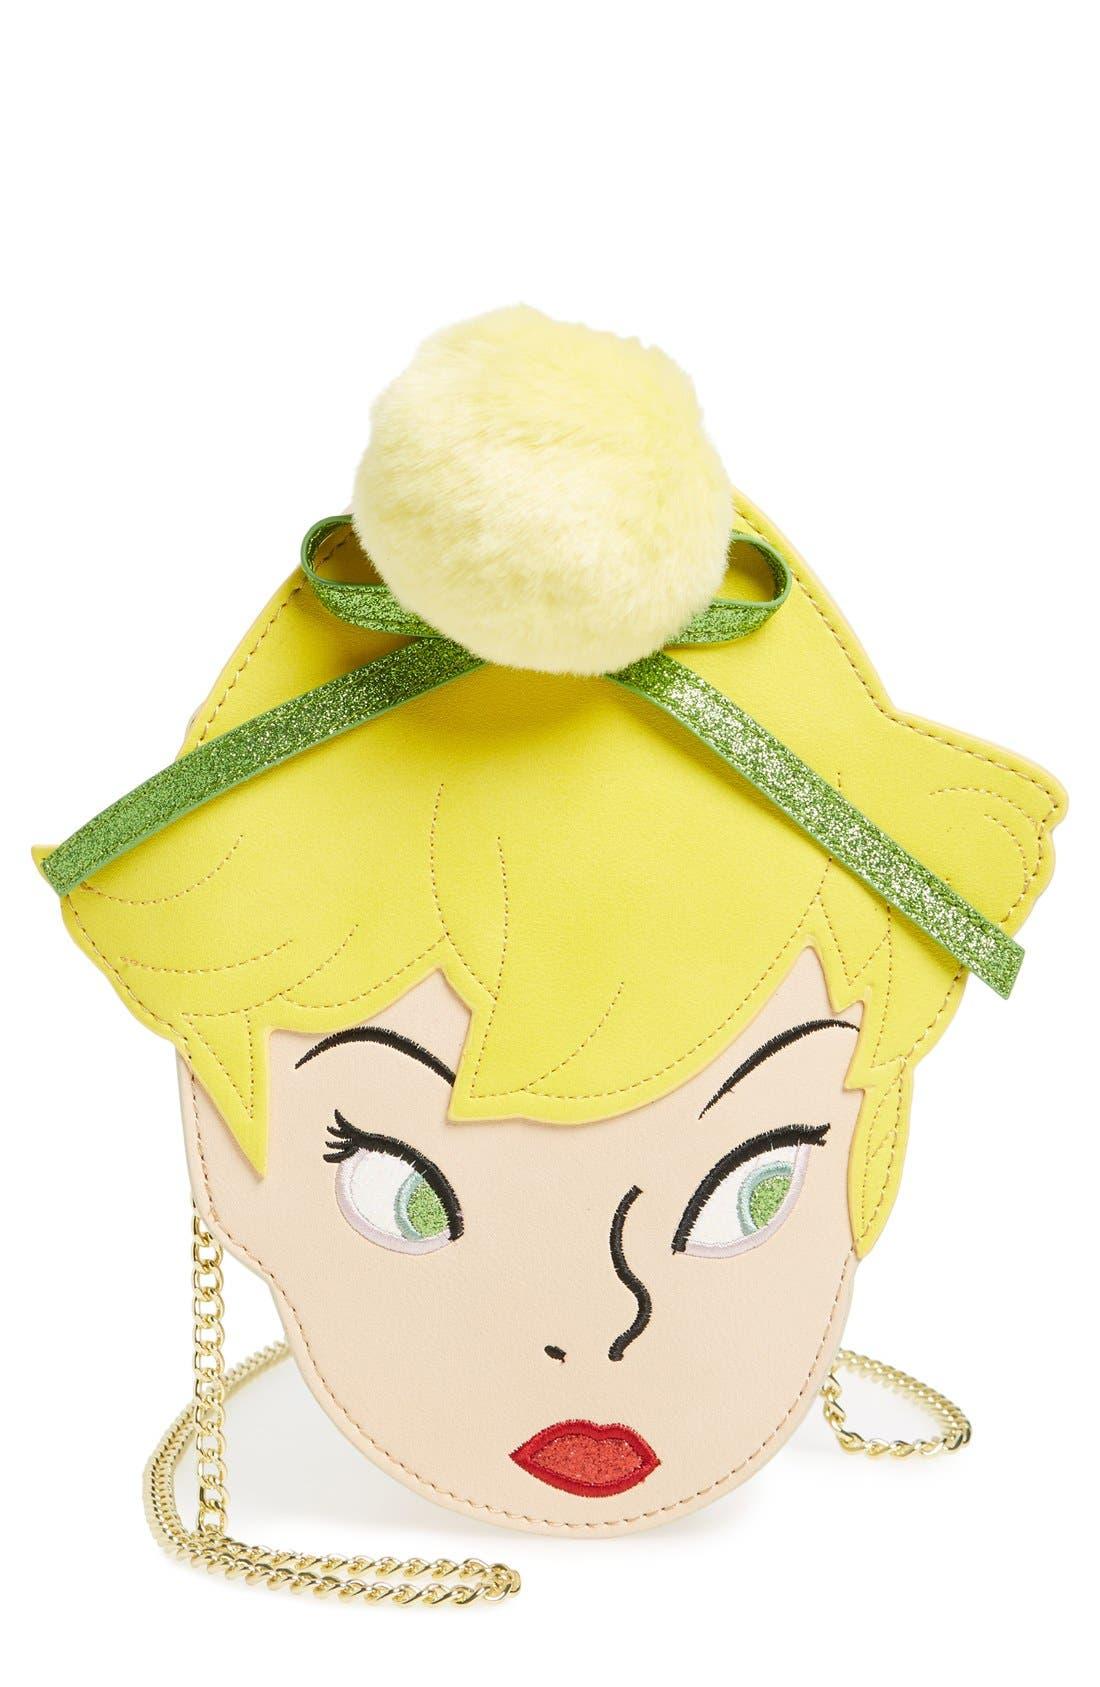 Main Image - Danielle Nicole x Disney® Tinker Bell Faux Leather Crossbody Bag